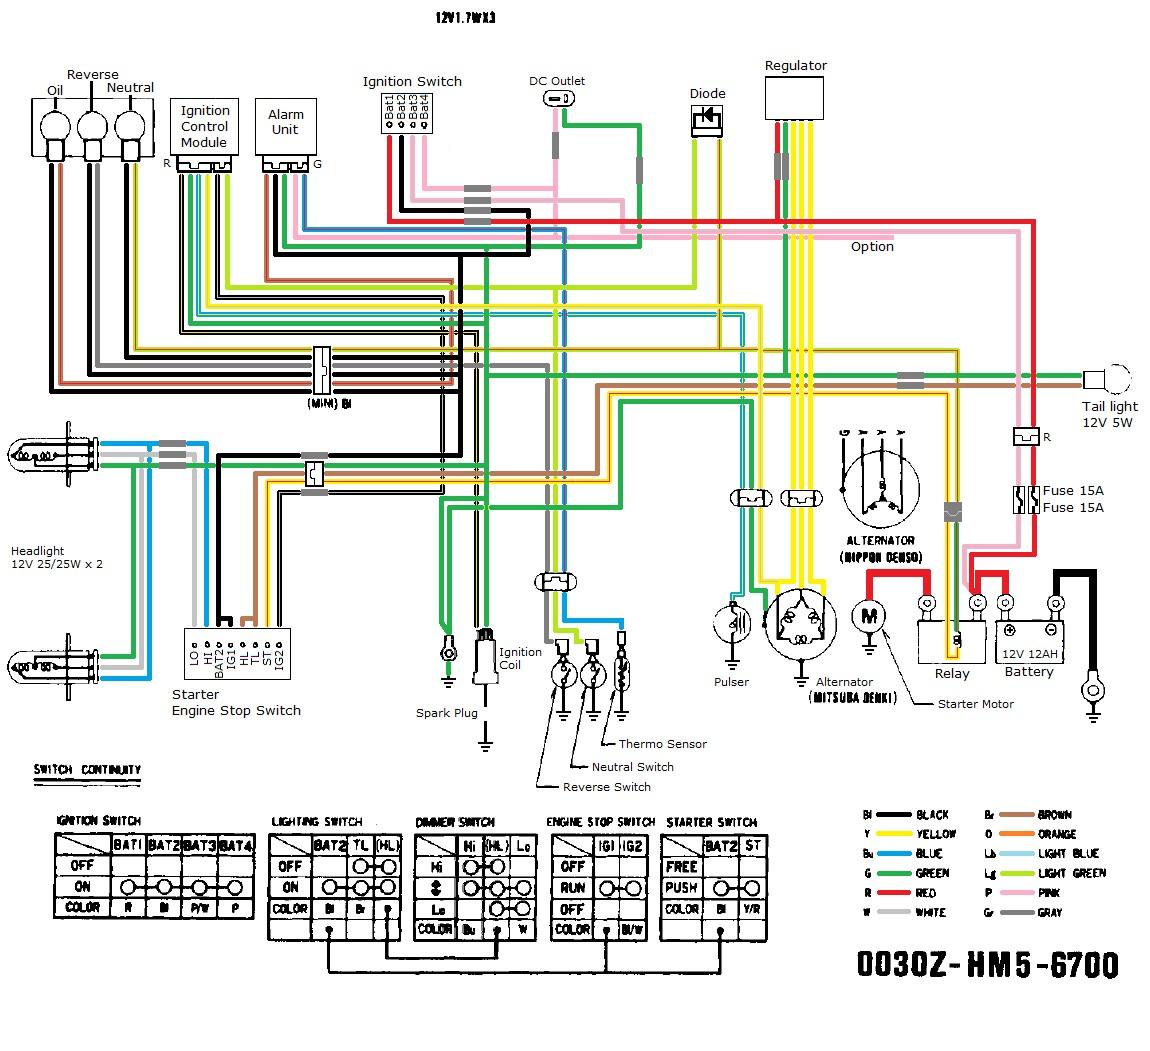 110cc Chinese atv Wiring Diagram Chinese 110cc atv Wiring Diagram